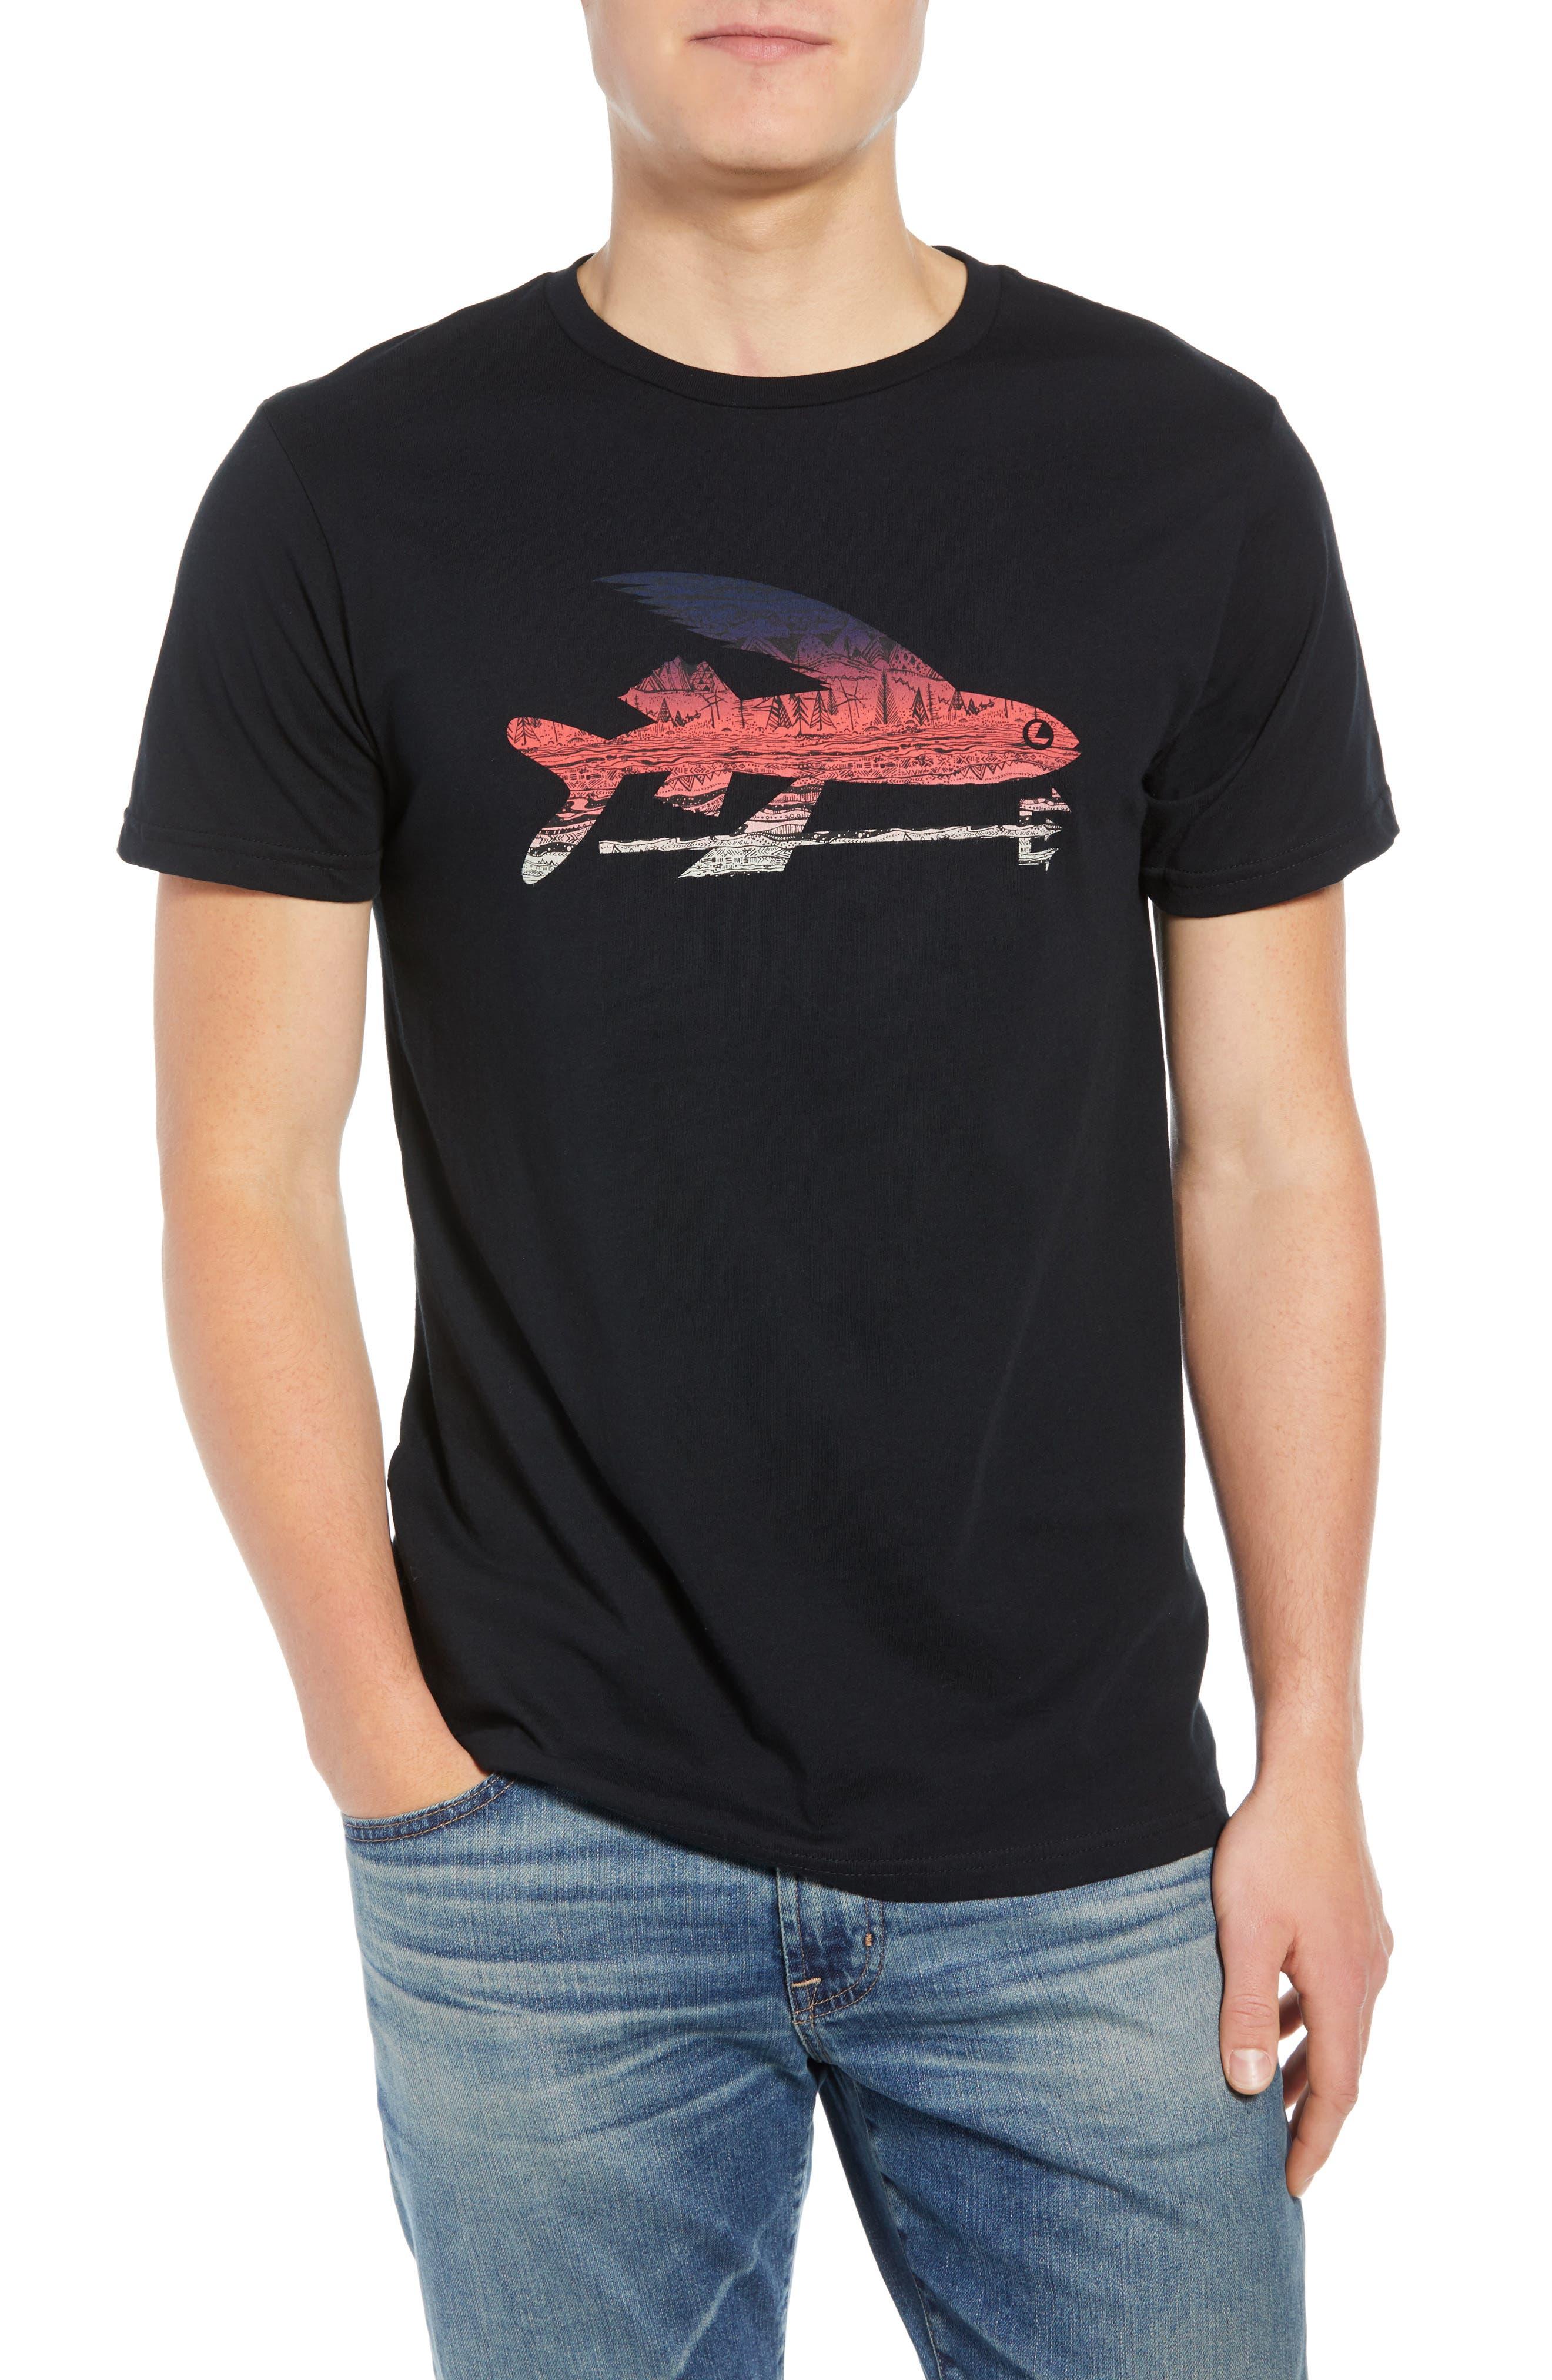 Flying Fish Organic Cotton T-Shirt,                             Main thumbnail 1, color,                             BLACK/ ALBANIAN LANDSCAPE